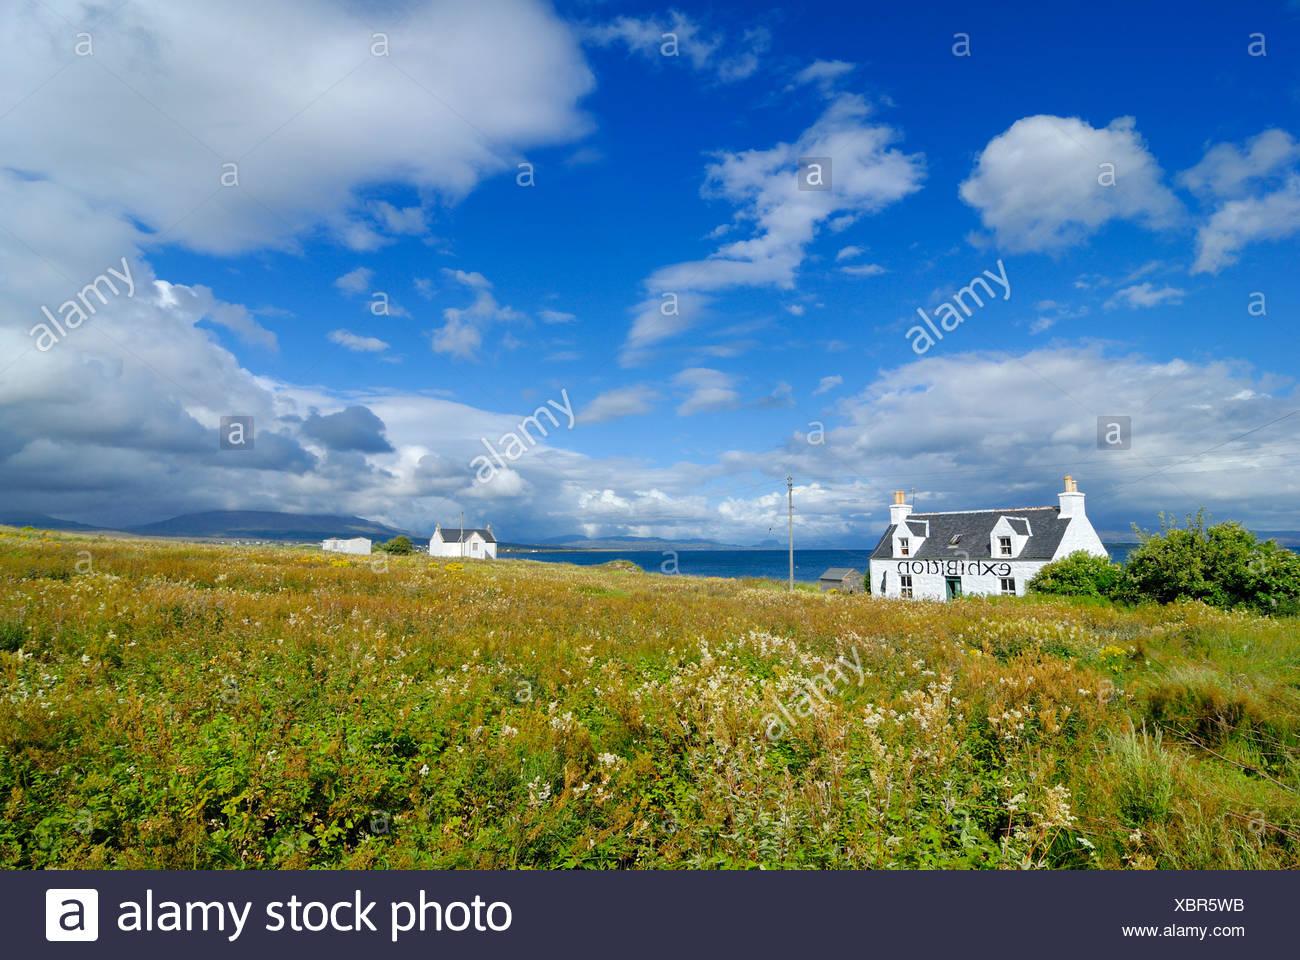 Houses on Broadford Bay, Isle of Skye, Scotland, Great Britain, Europe - Stock Image